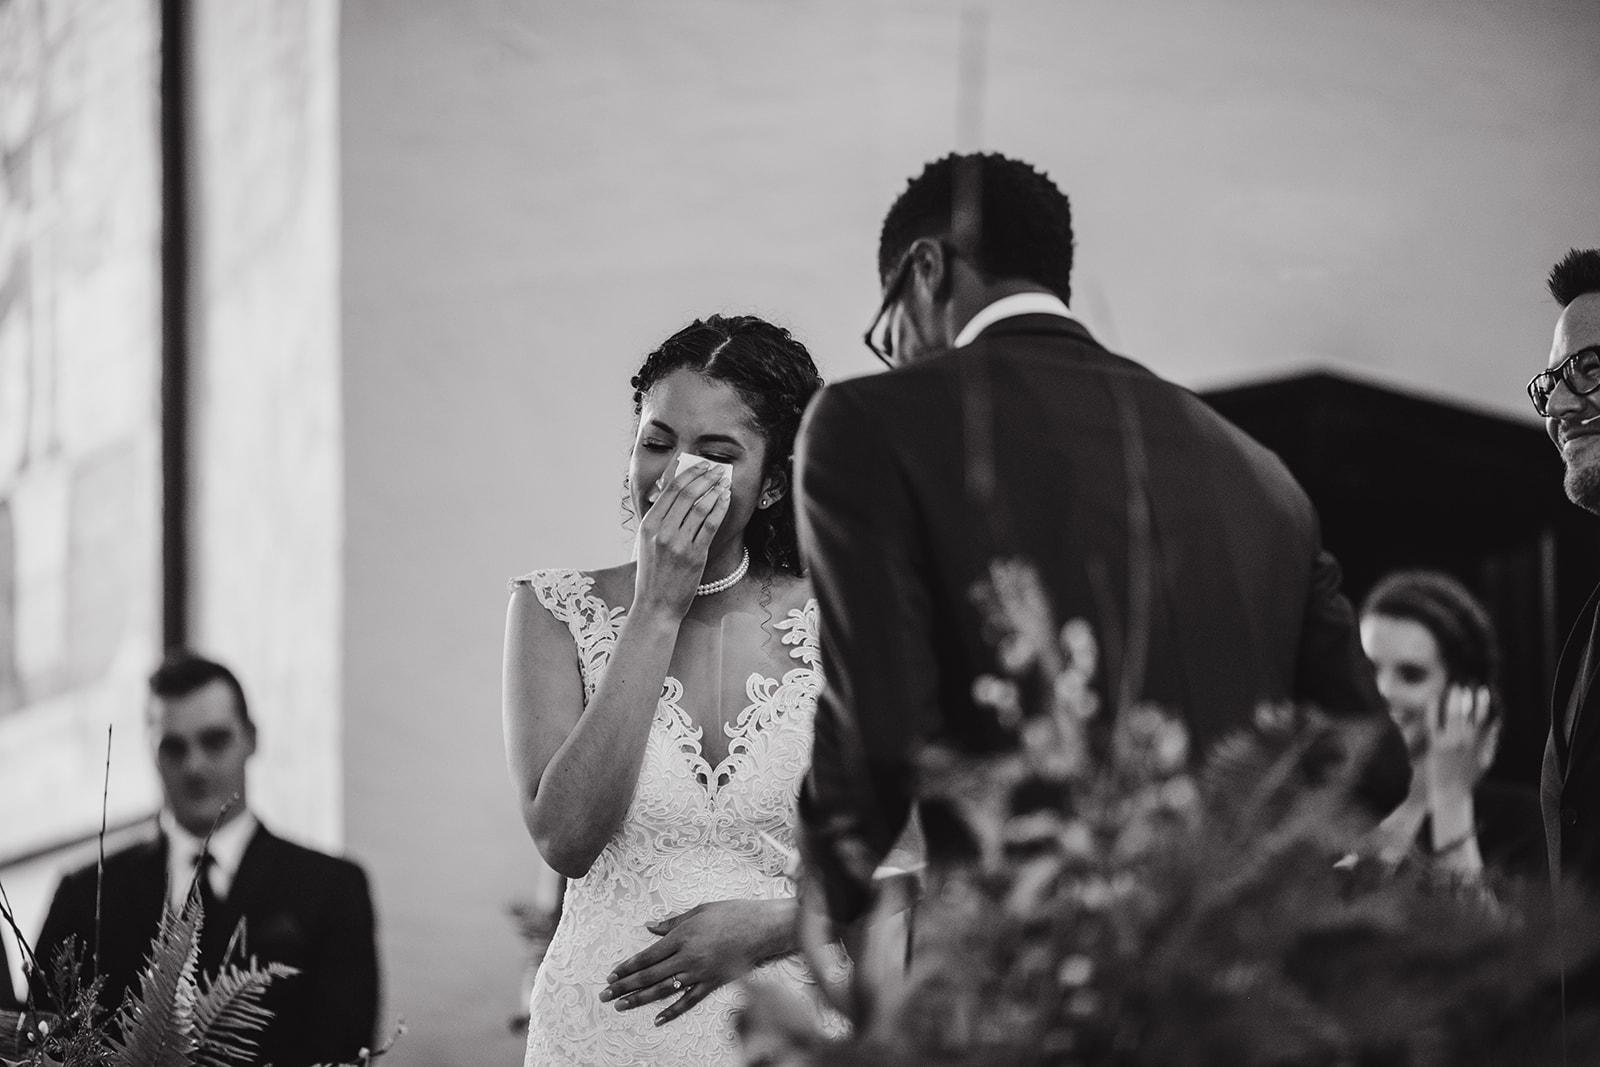 portland - wedding - photographer - doorofhopechurch489.jpg